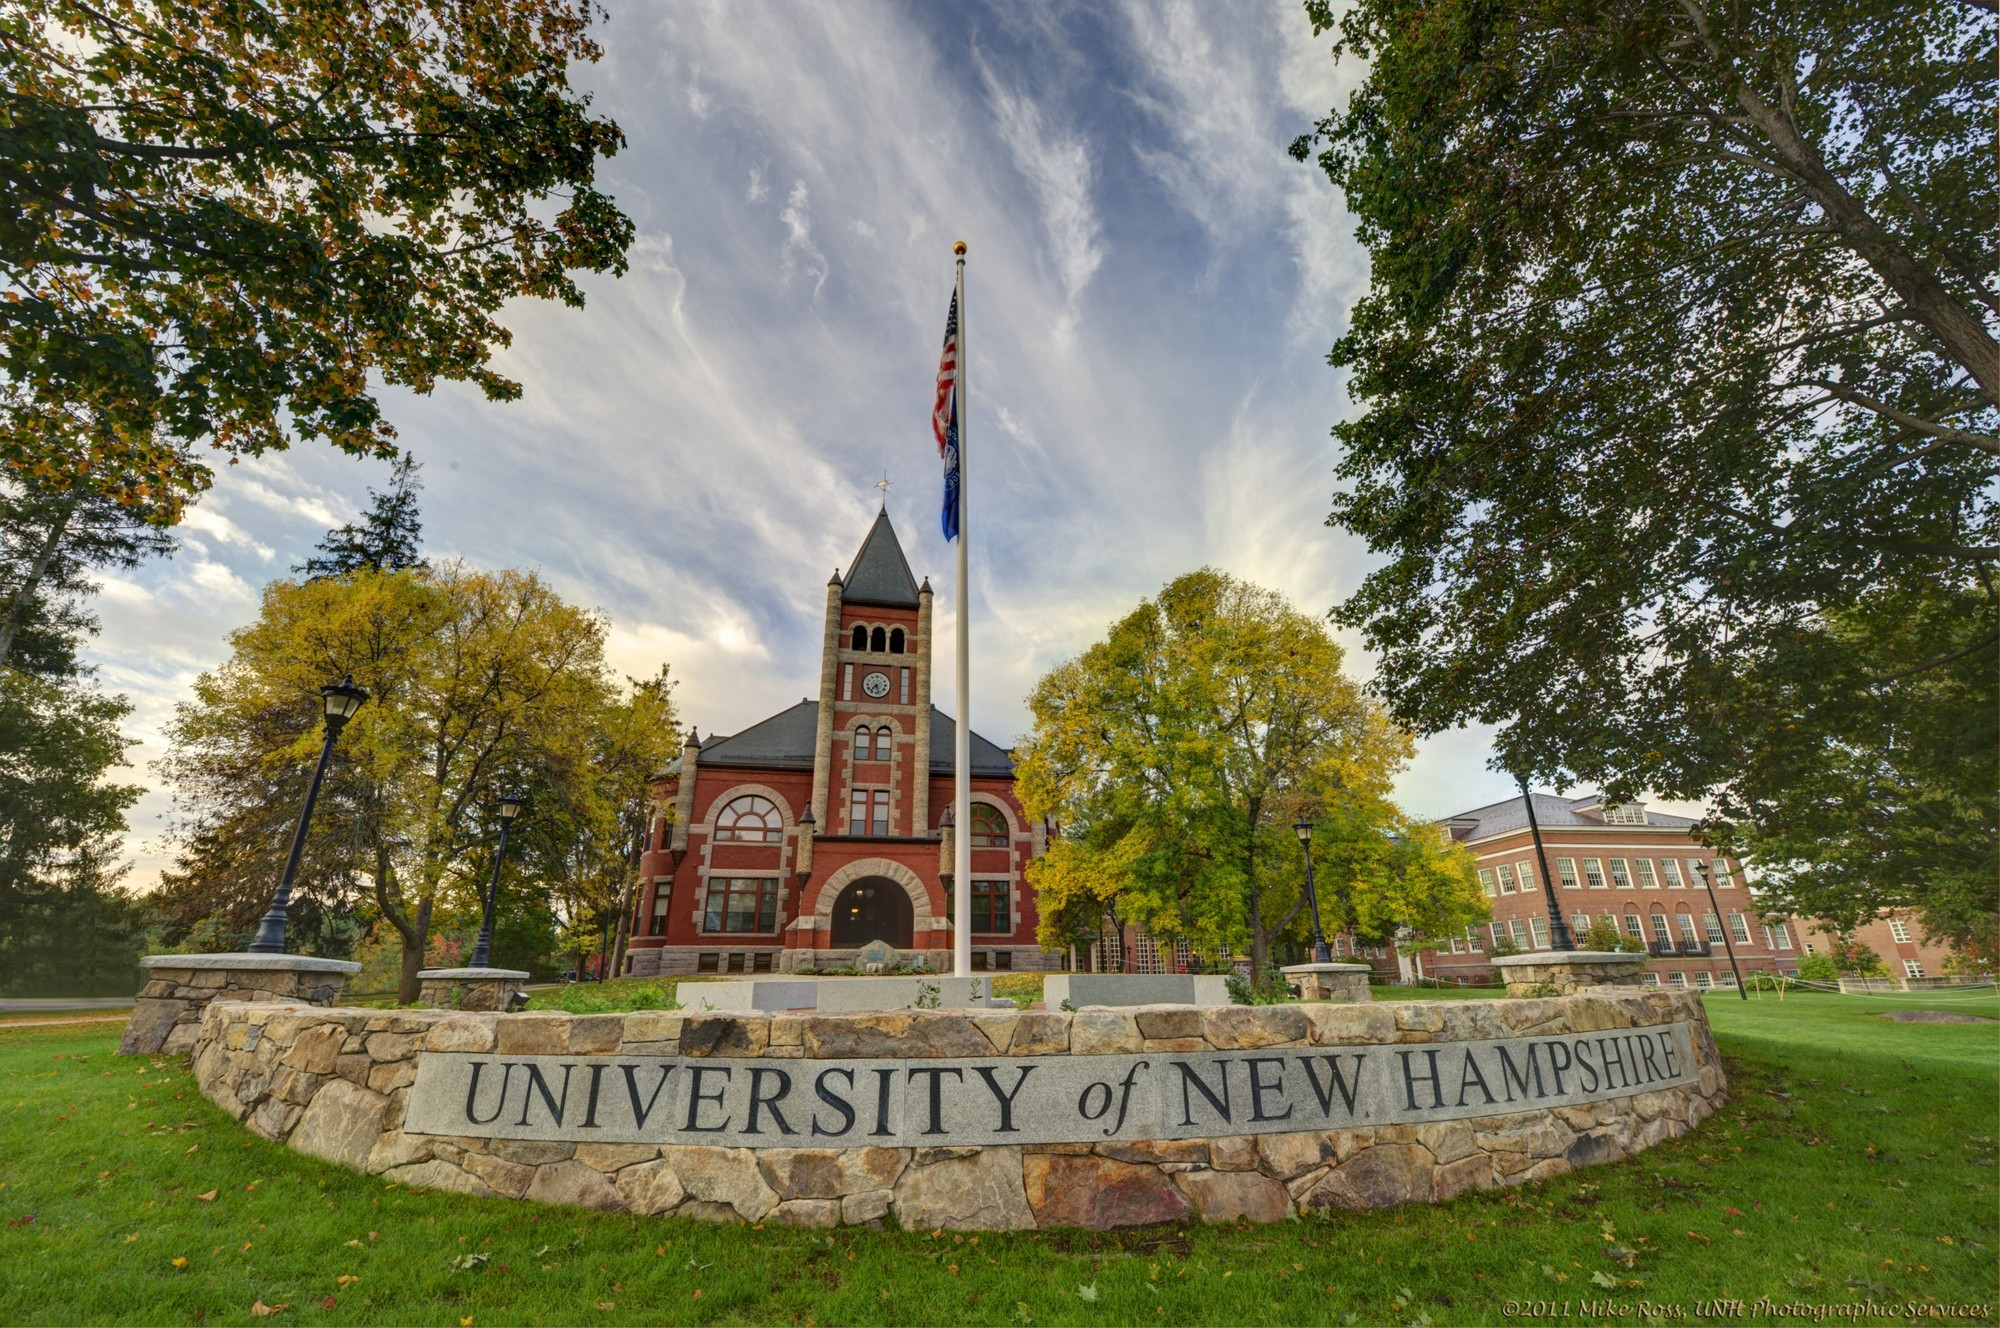 University of New Hampshire main campus sign